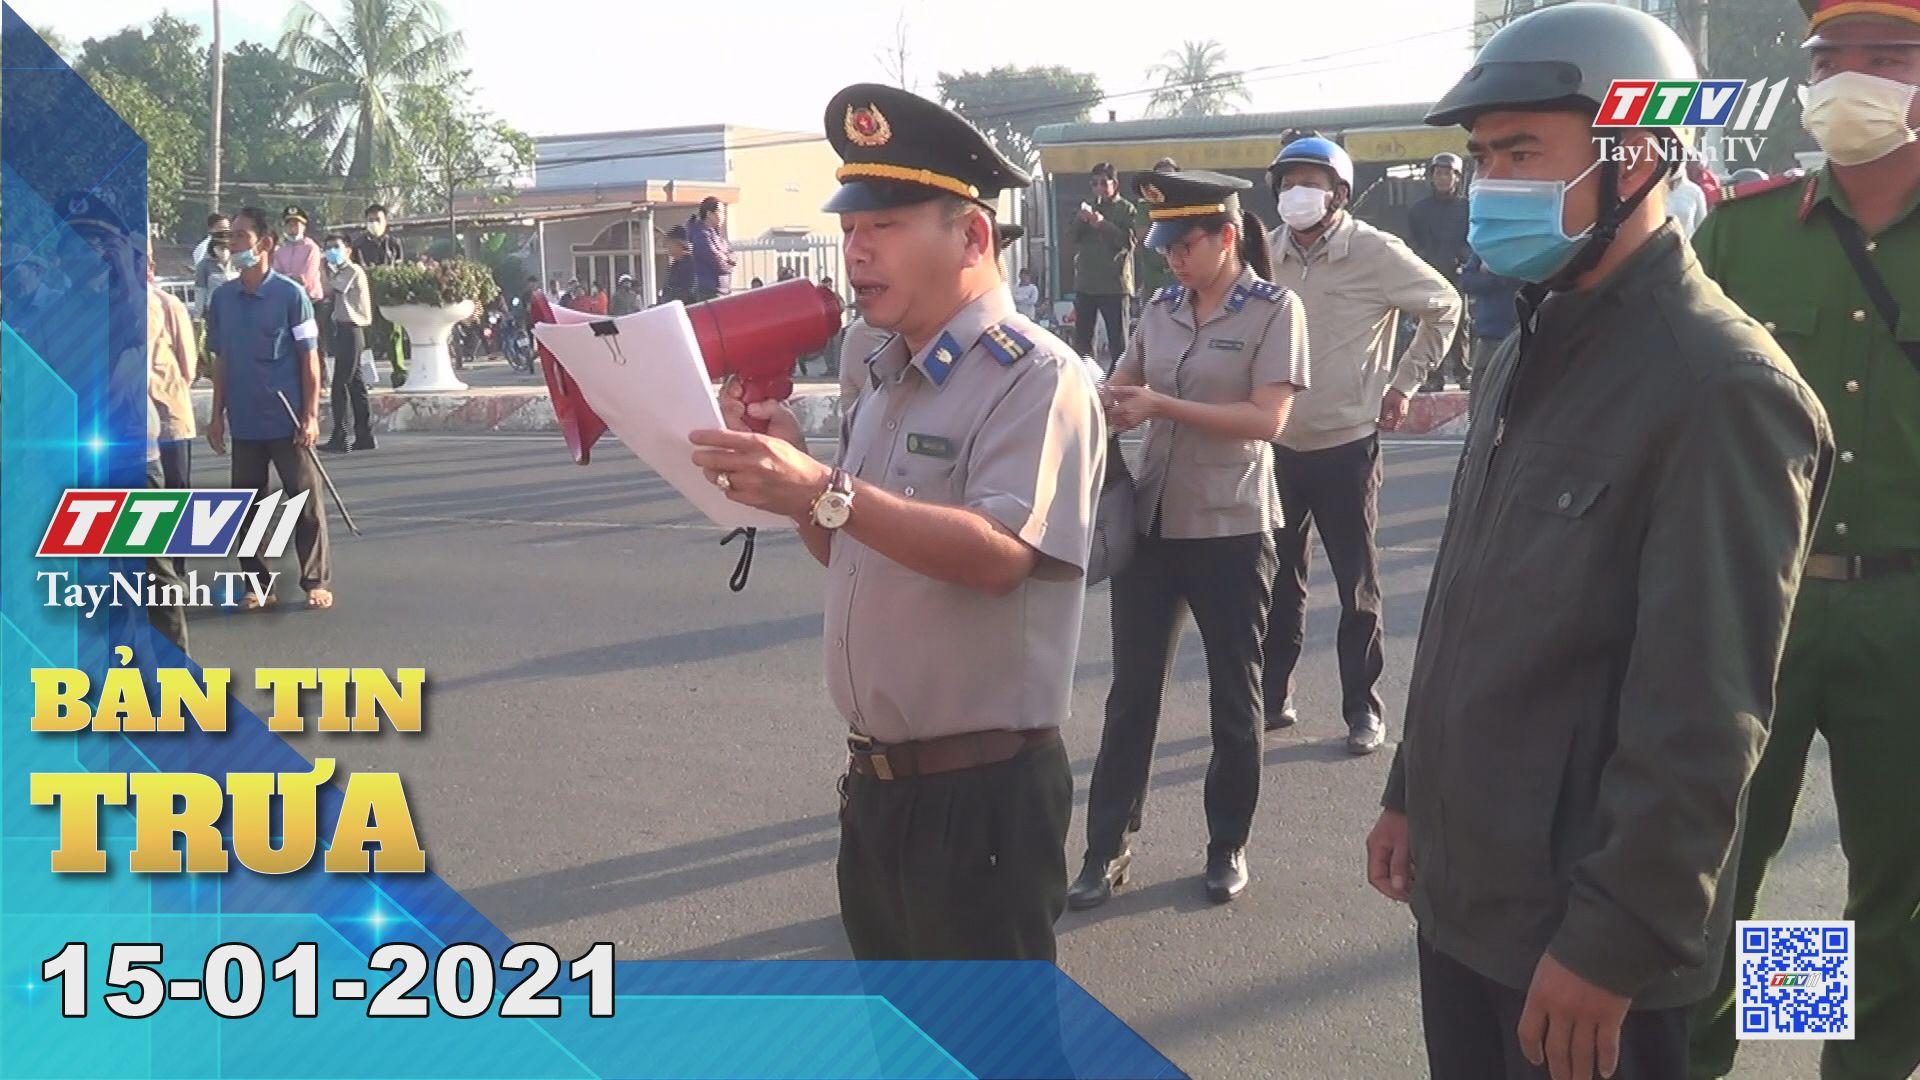 Bản tin trưa 15-01-2021 | Tin tức hôm nay | TayNinhTV